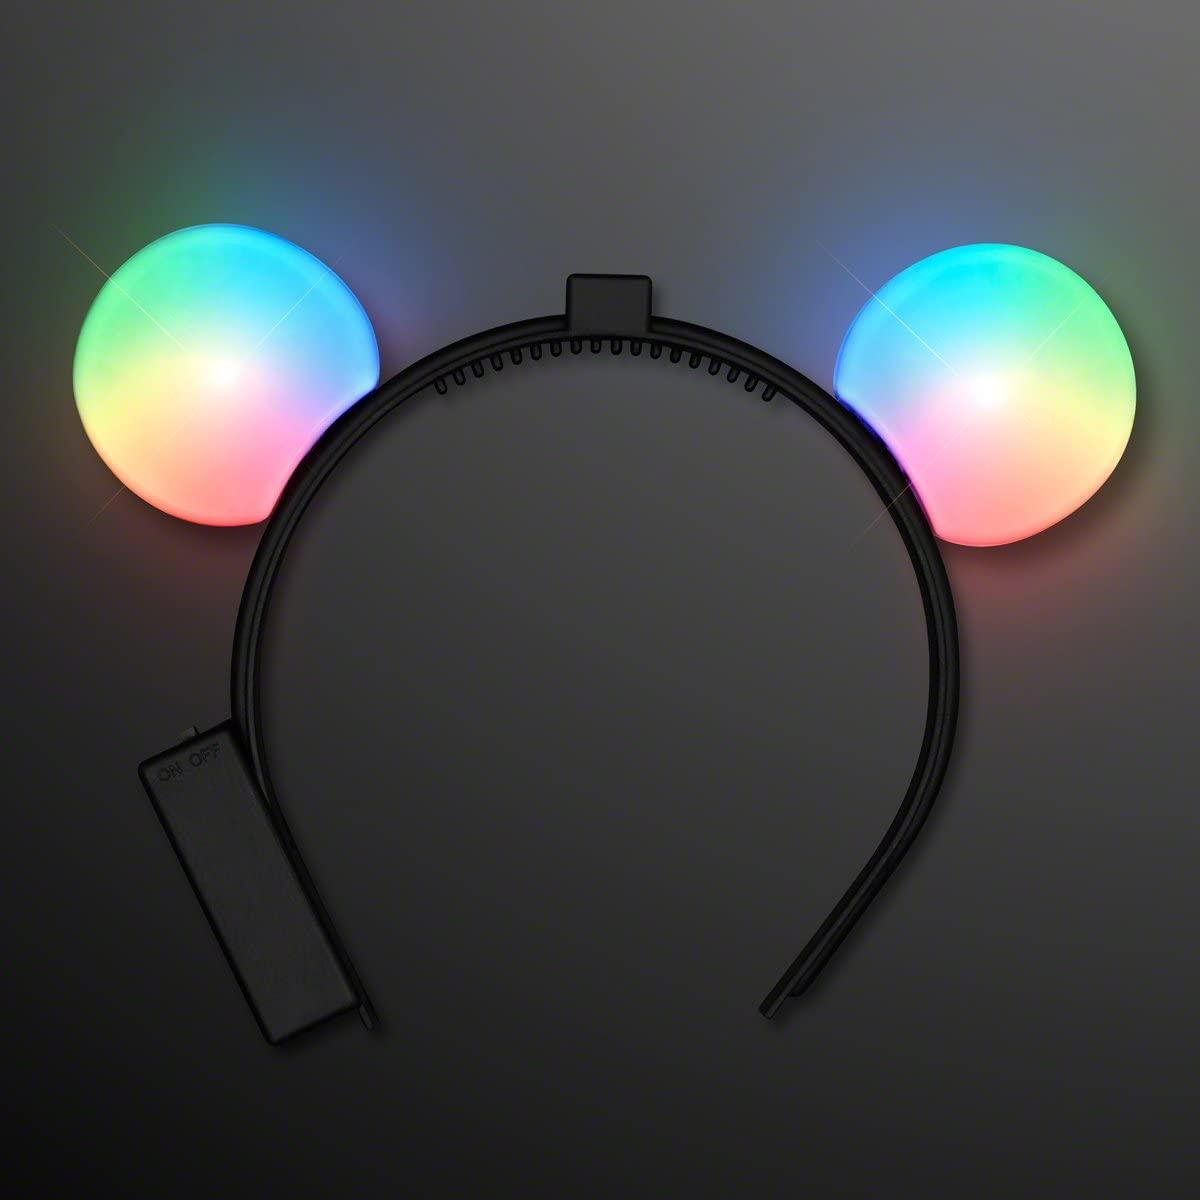 FlashingBlinkyLights Color Changing LED Mouse Ears Light up Headband